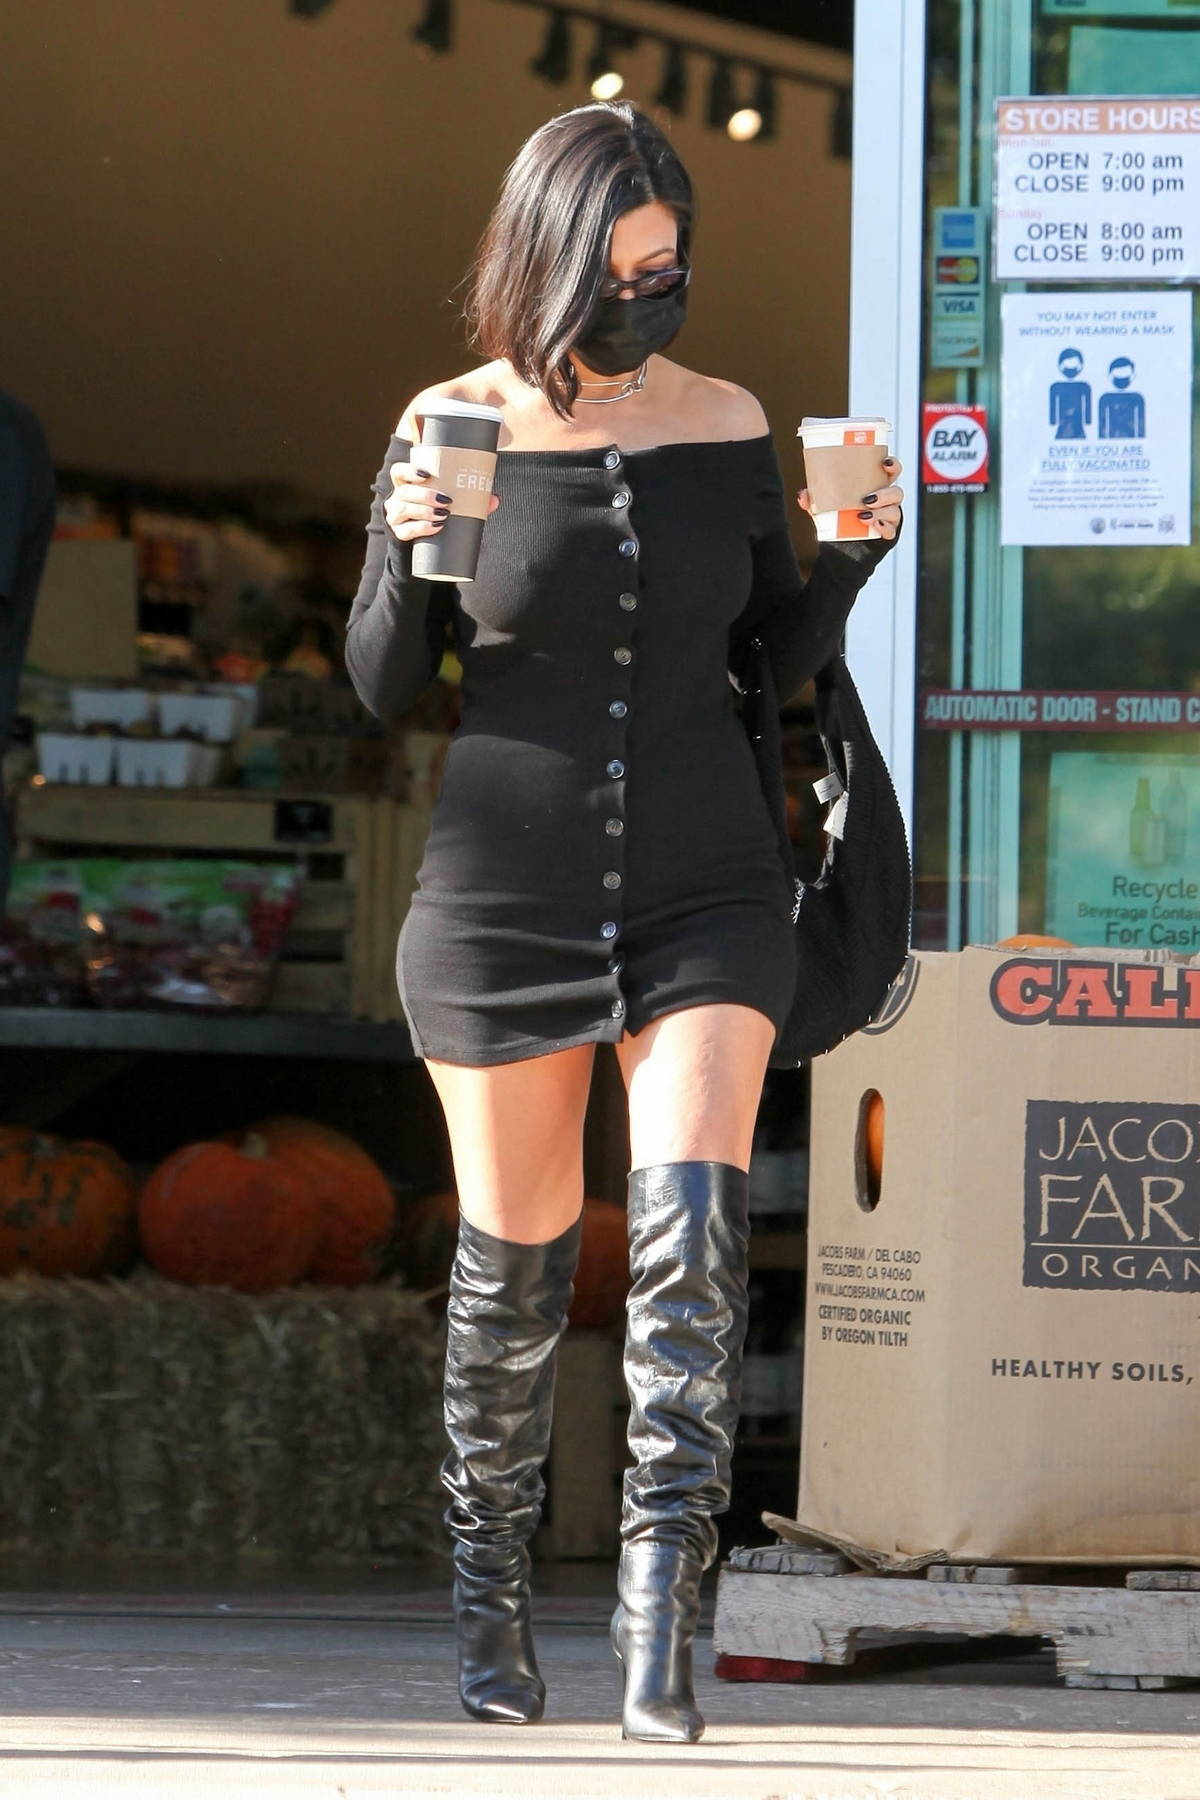 Kourtney Kardashian gets leggy in a short black dress while making a coffee run at Erewhon Market in Calabasas, California